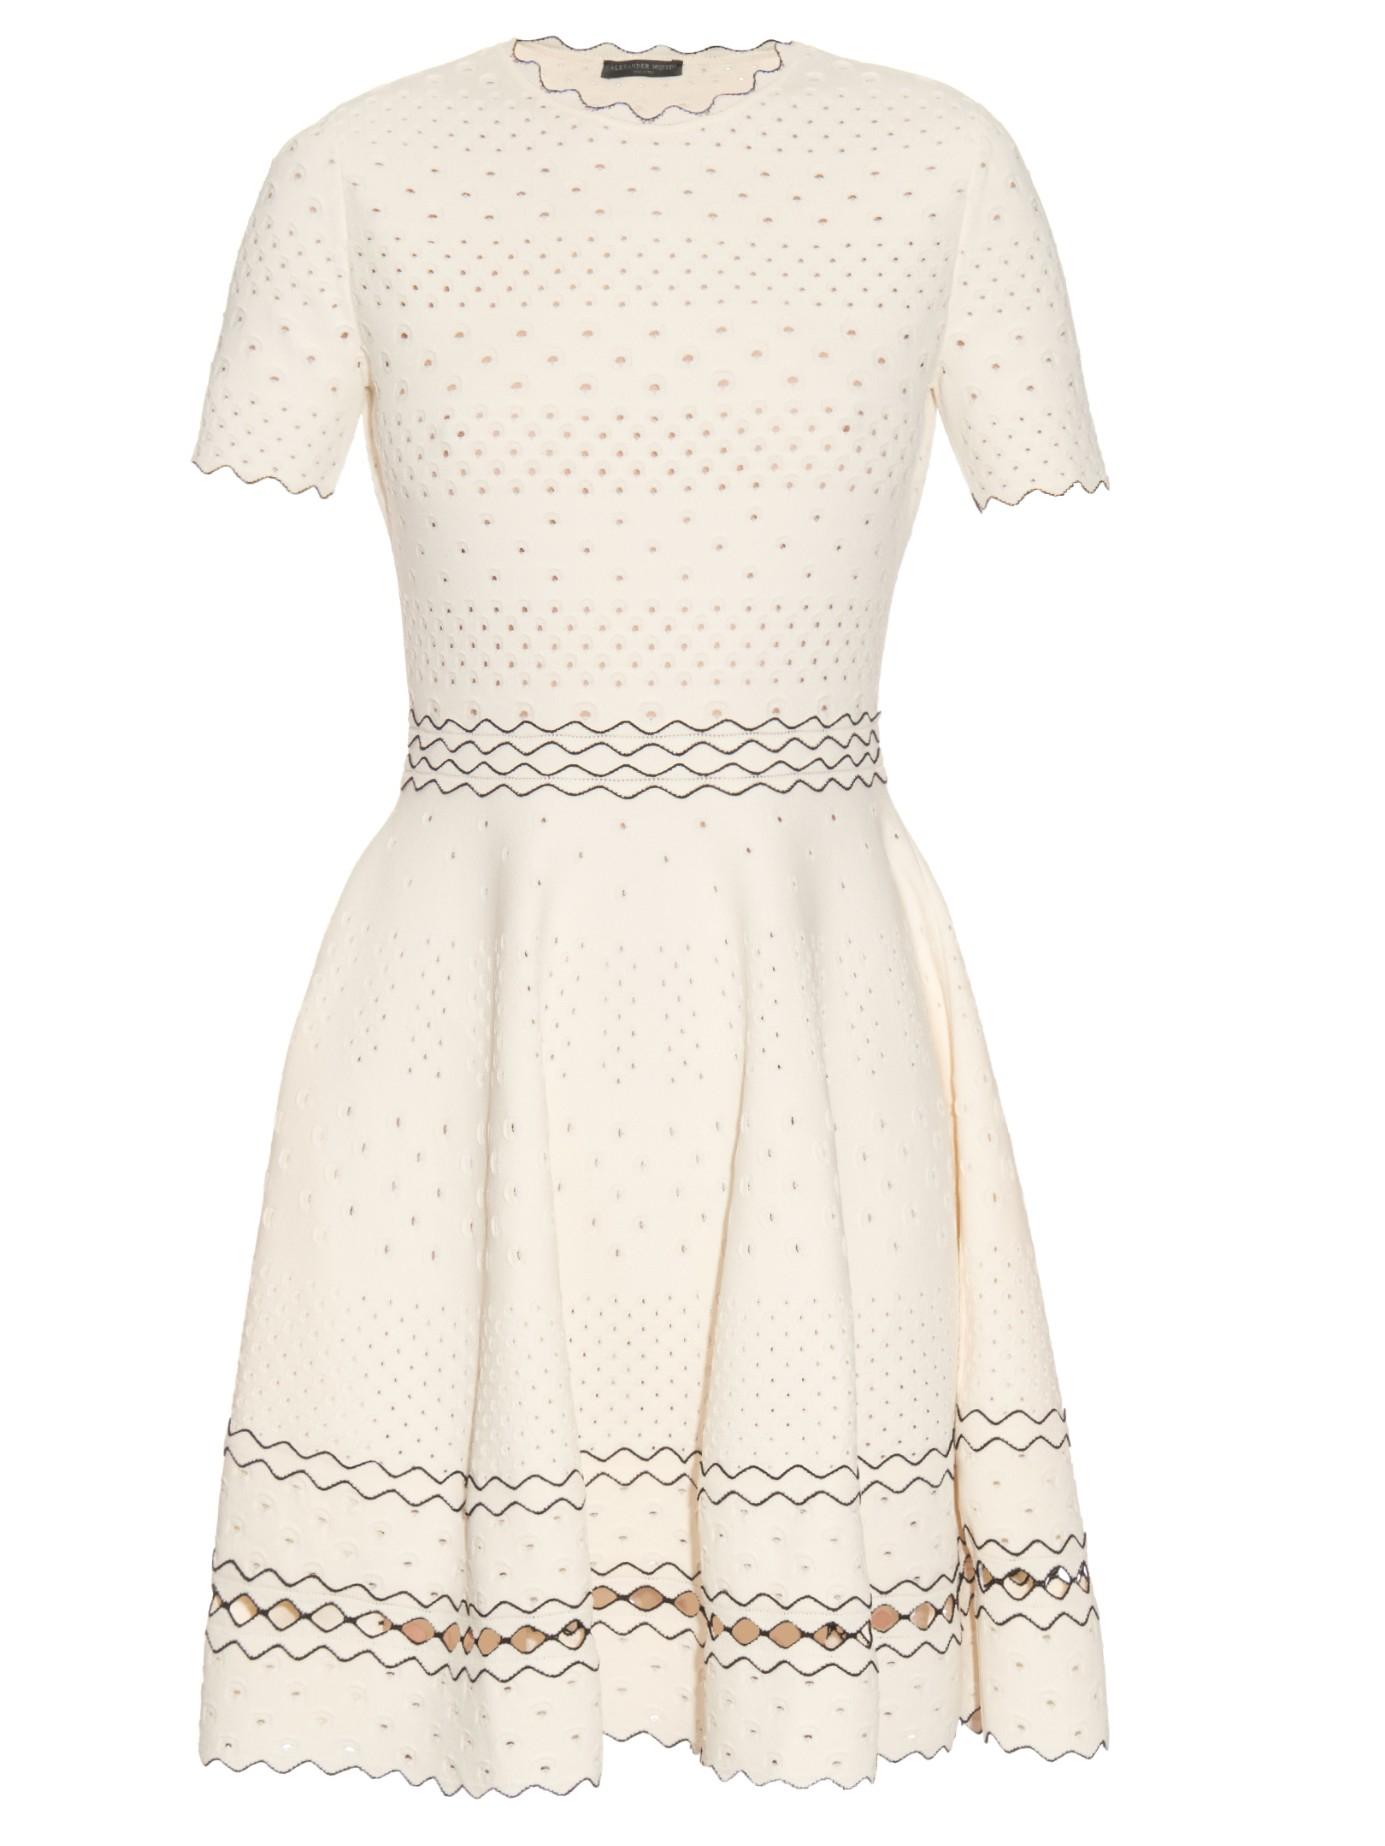 c546dfac553 Alexander McQueen Short-sleeved Textured Eyelet-knit Dress in White ...